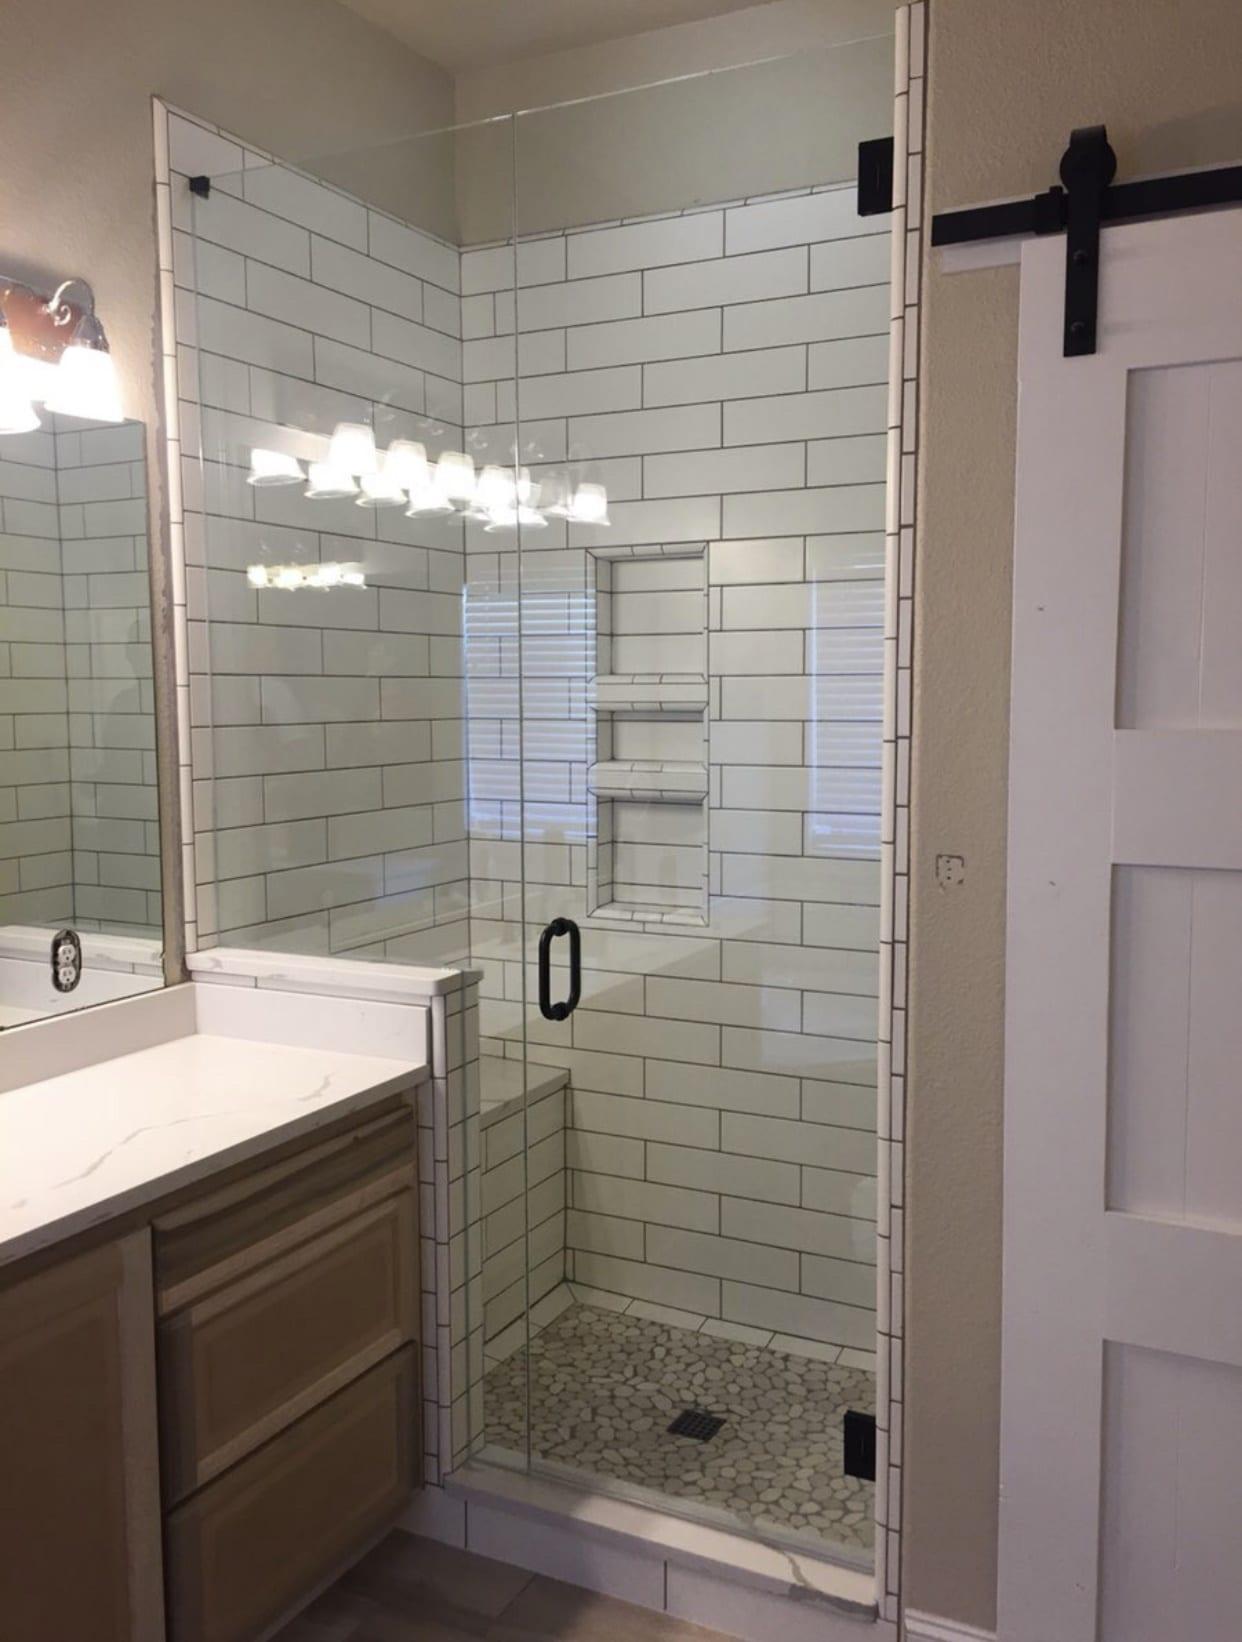 frameless shower doors img 2165 custom bathroom mirrors and decorative glass from Shower Doors of Nashville